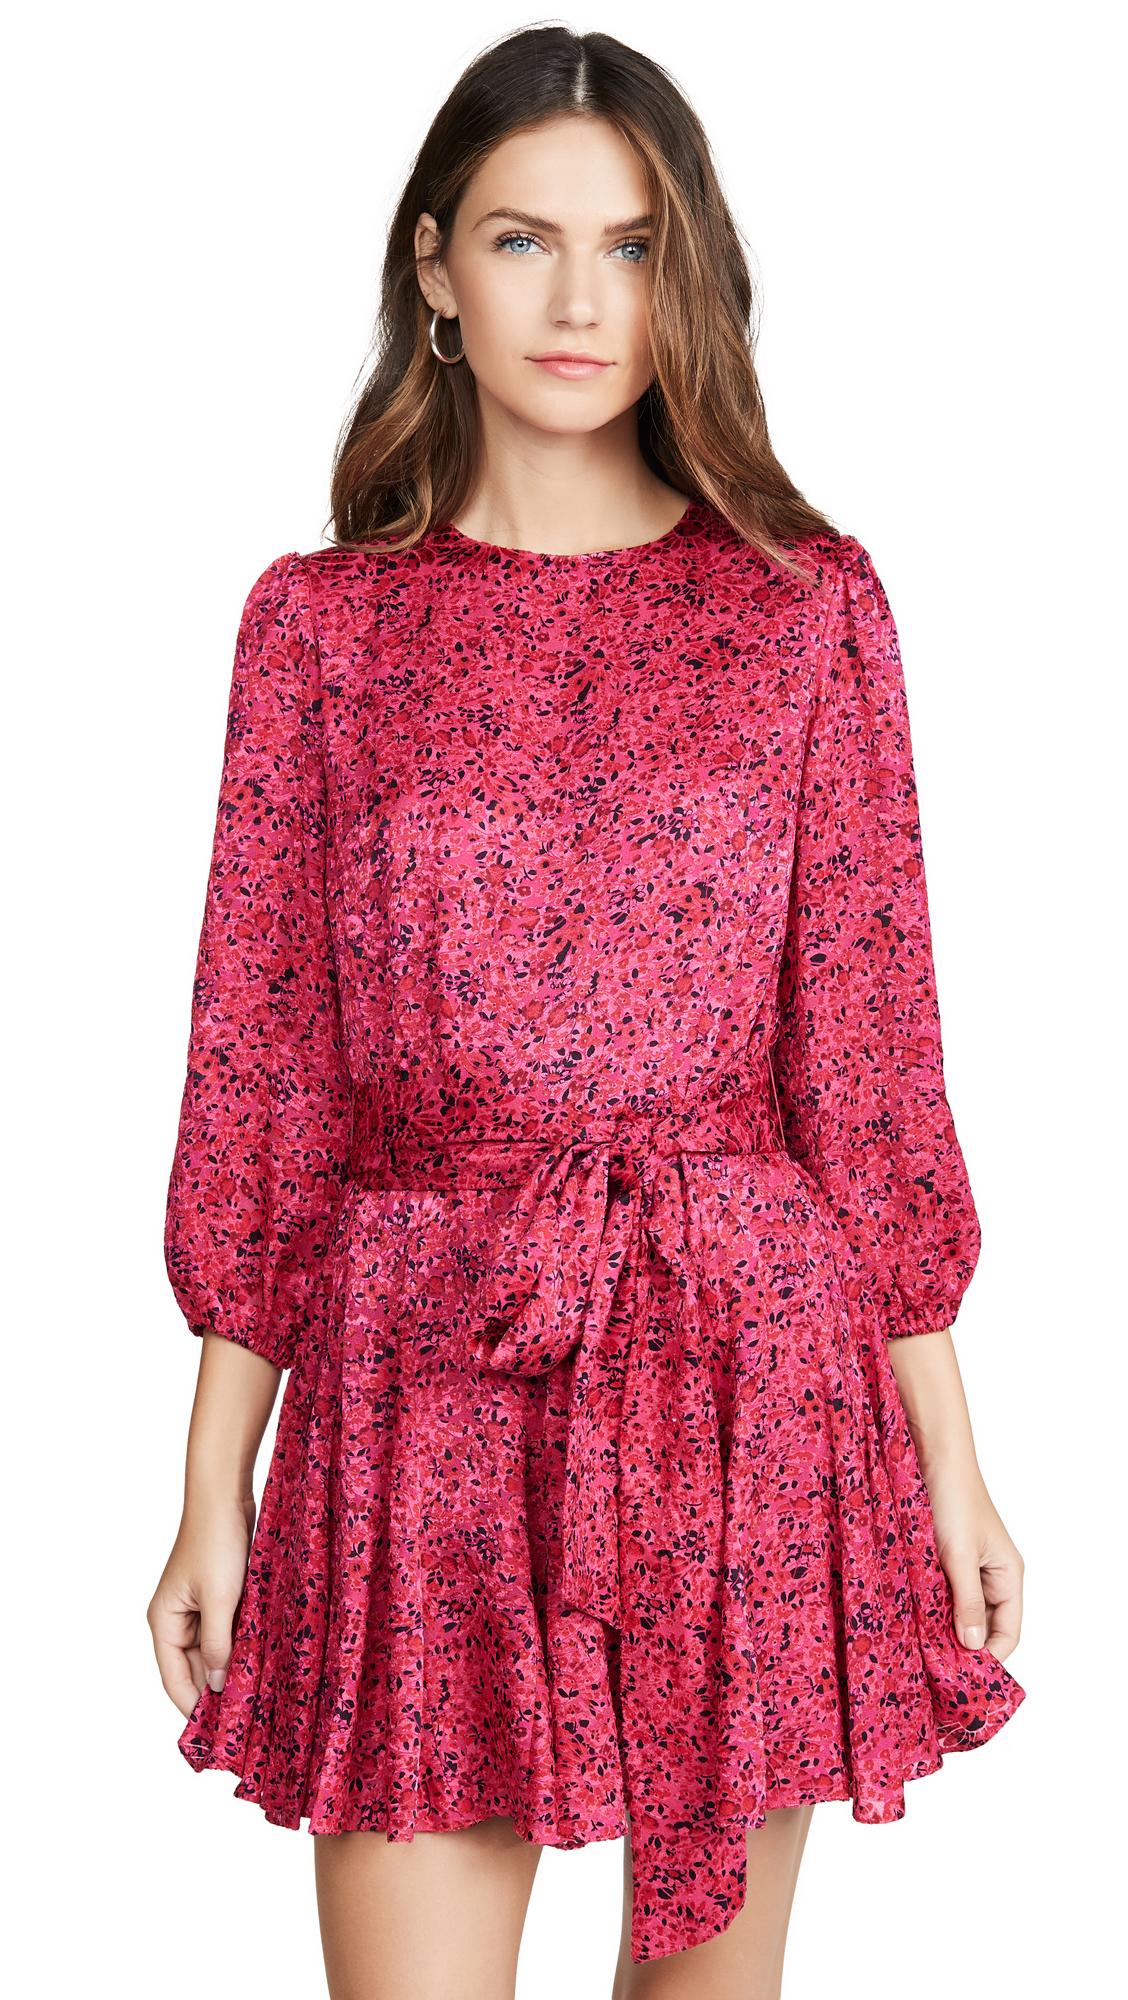 alice + olivia Mina Puff Sleeve Godet Dress with Belt - Bright Pink Multi